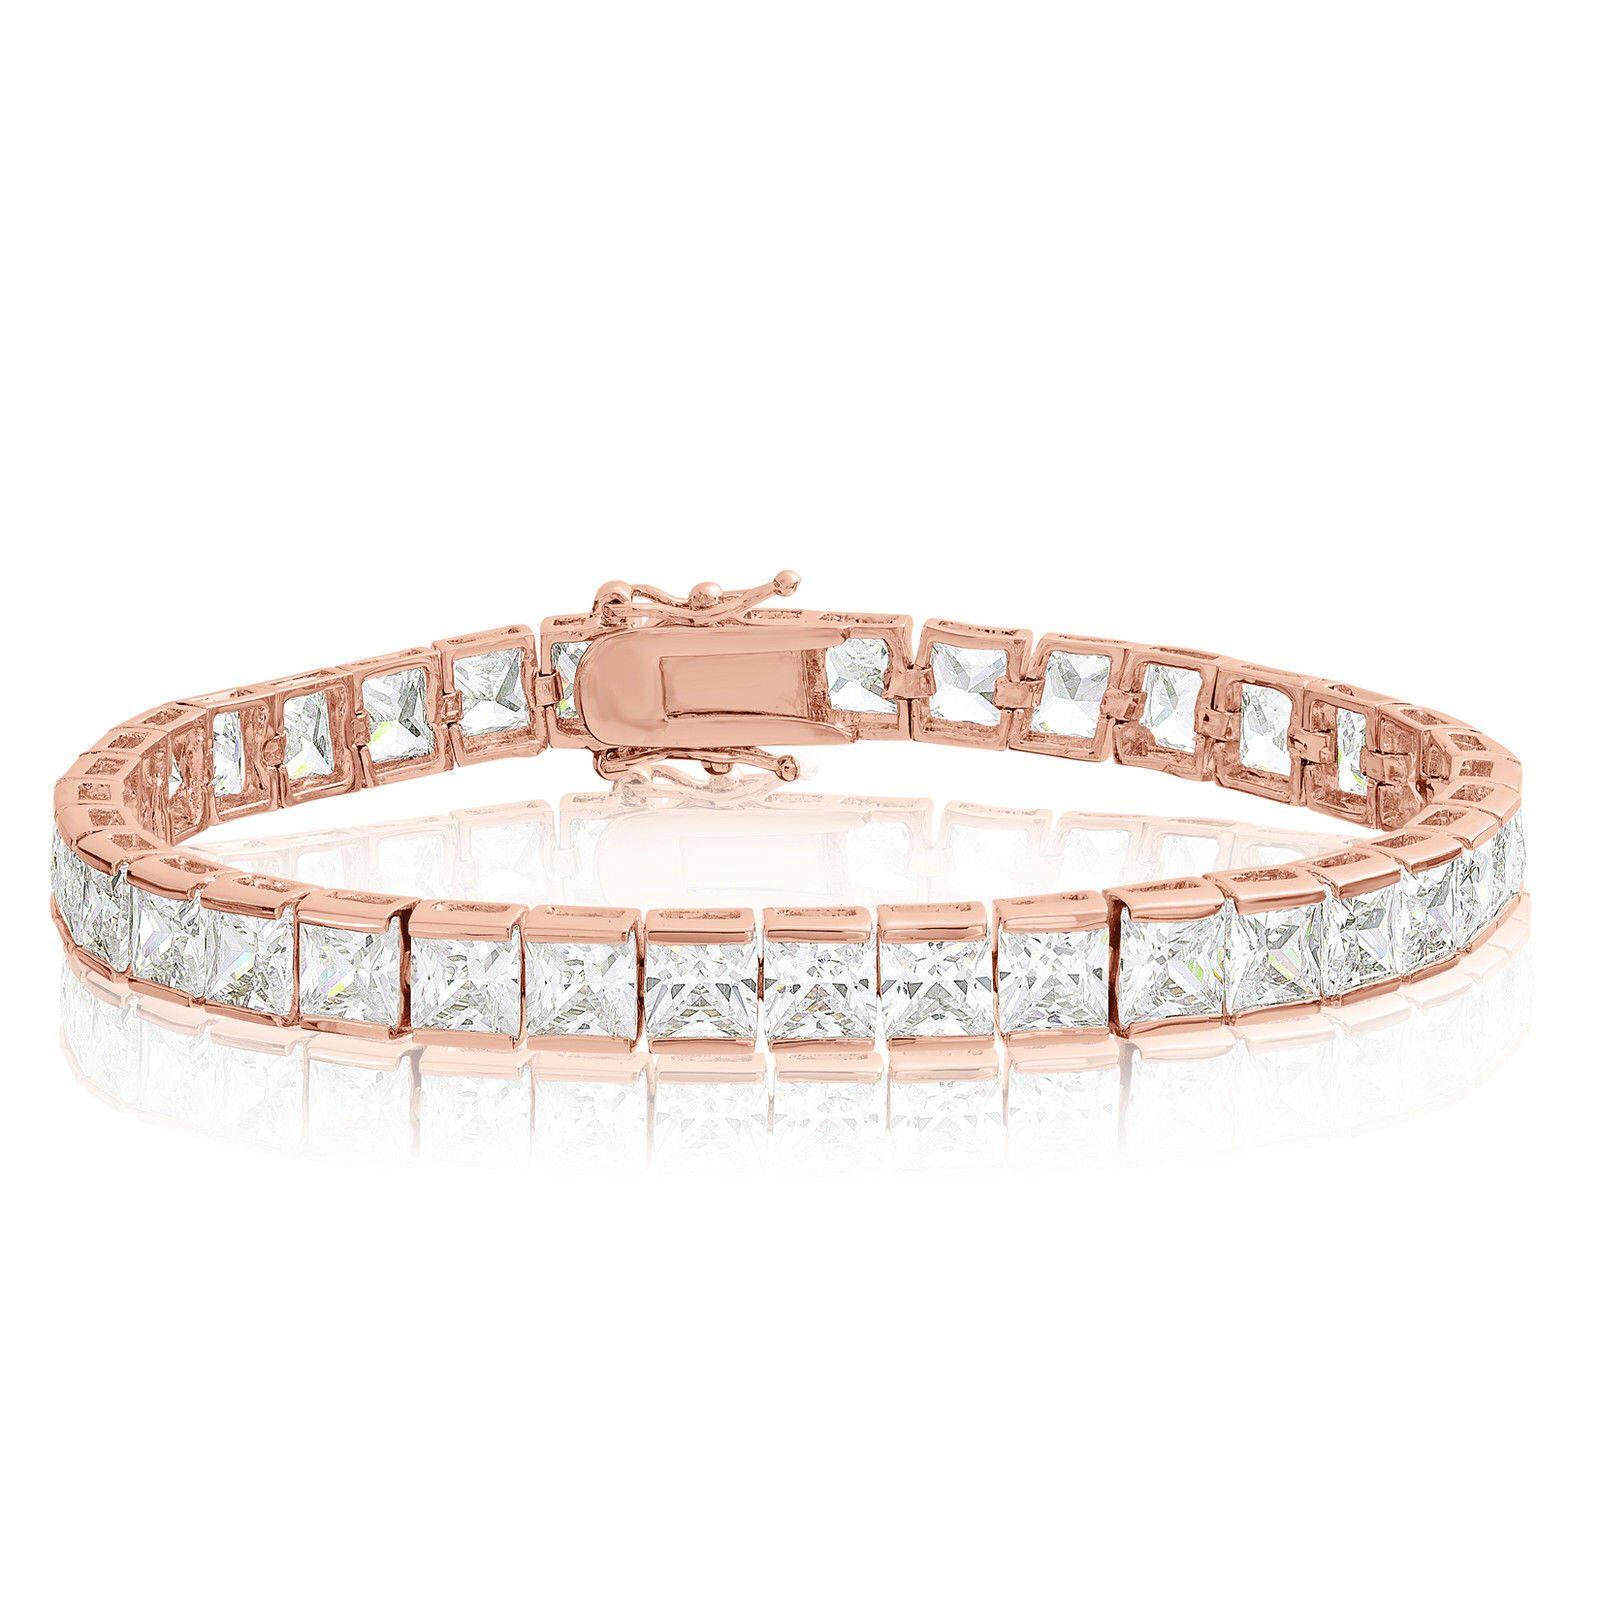 6bcefab63c6b4 Cubic Zirconia, Tennis Bracelet, Rose Gold Plated, 5x5mm Square ...